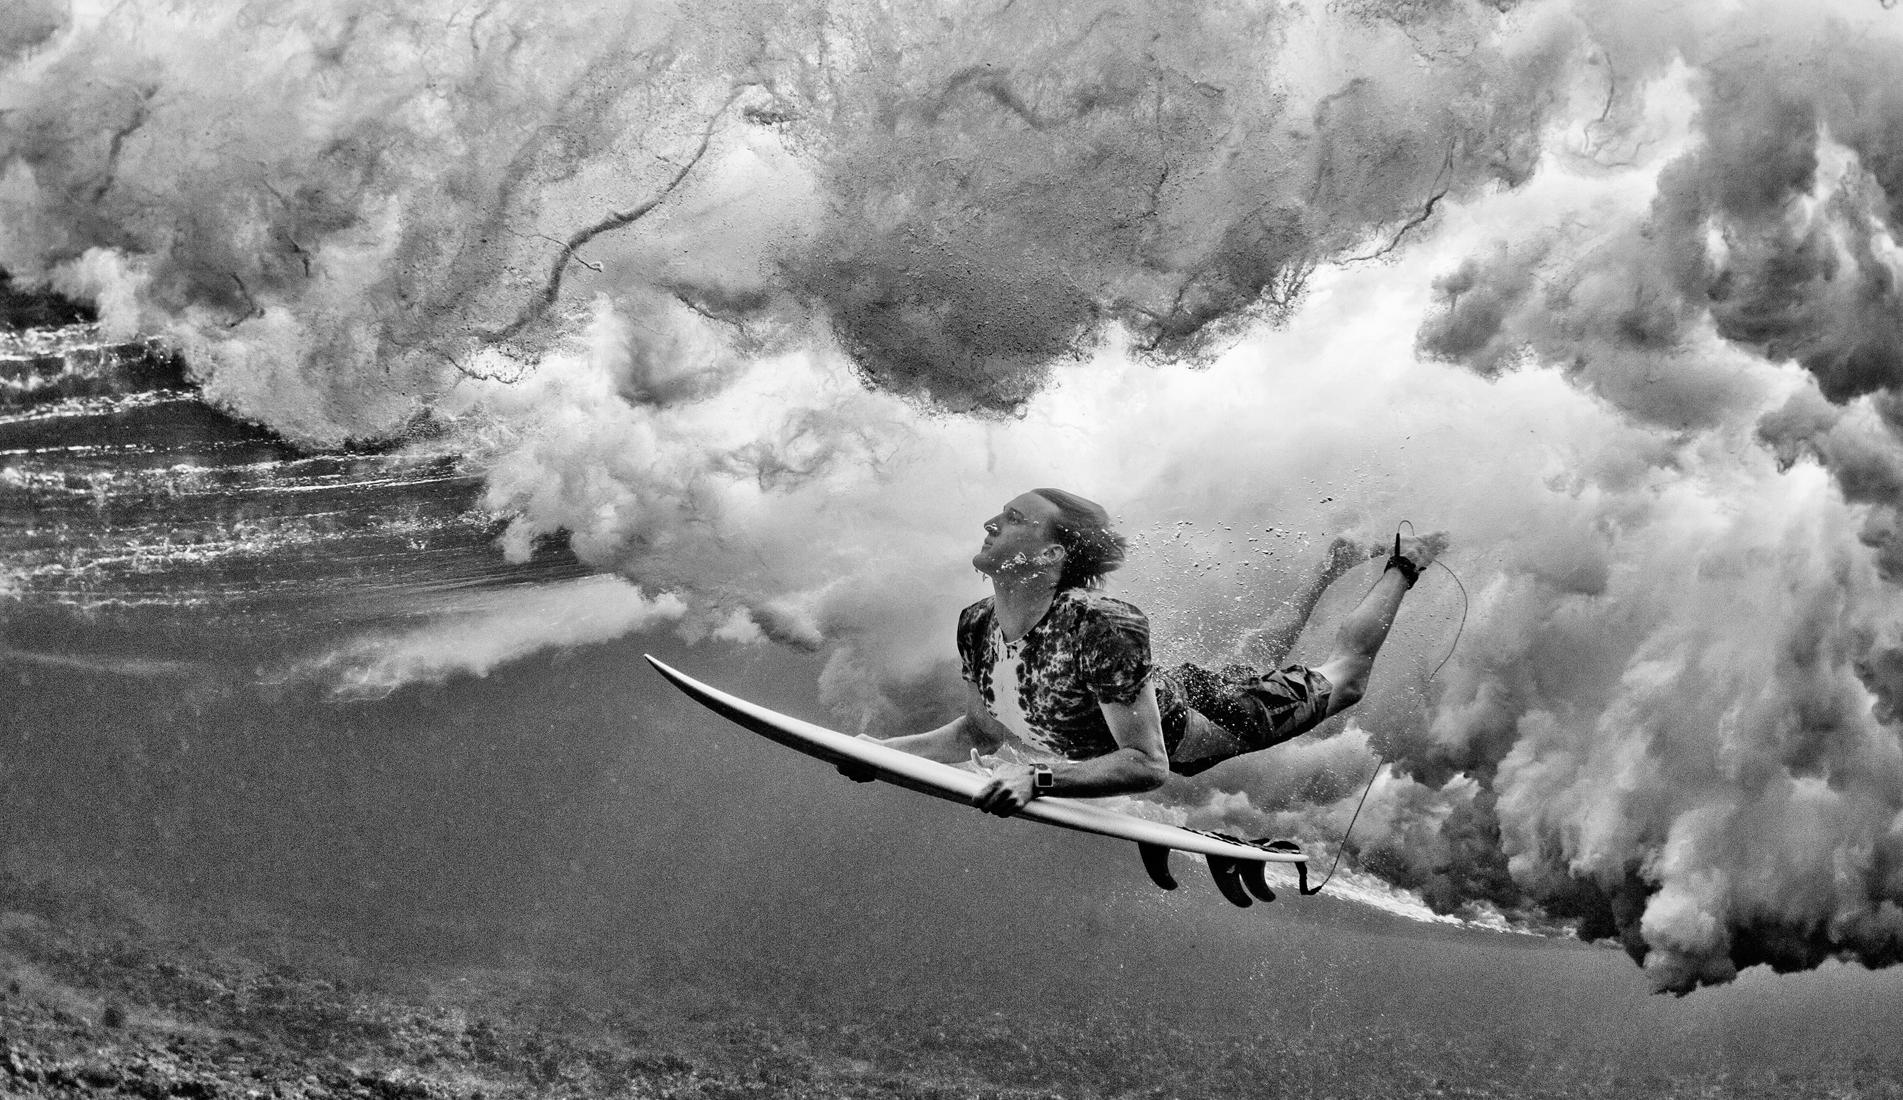 fotos-adrenalina-watersports-5